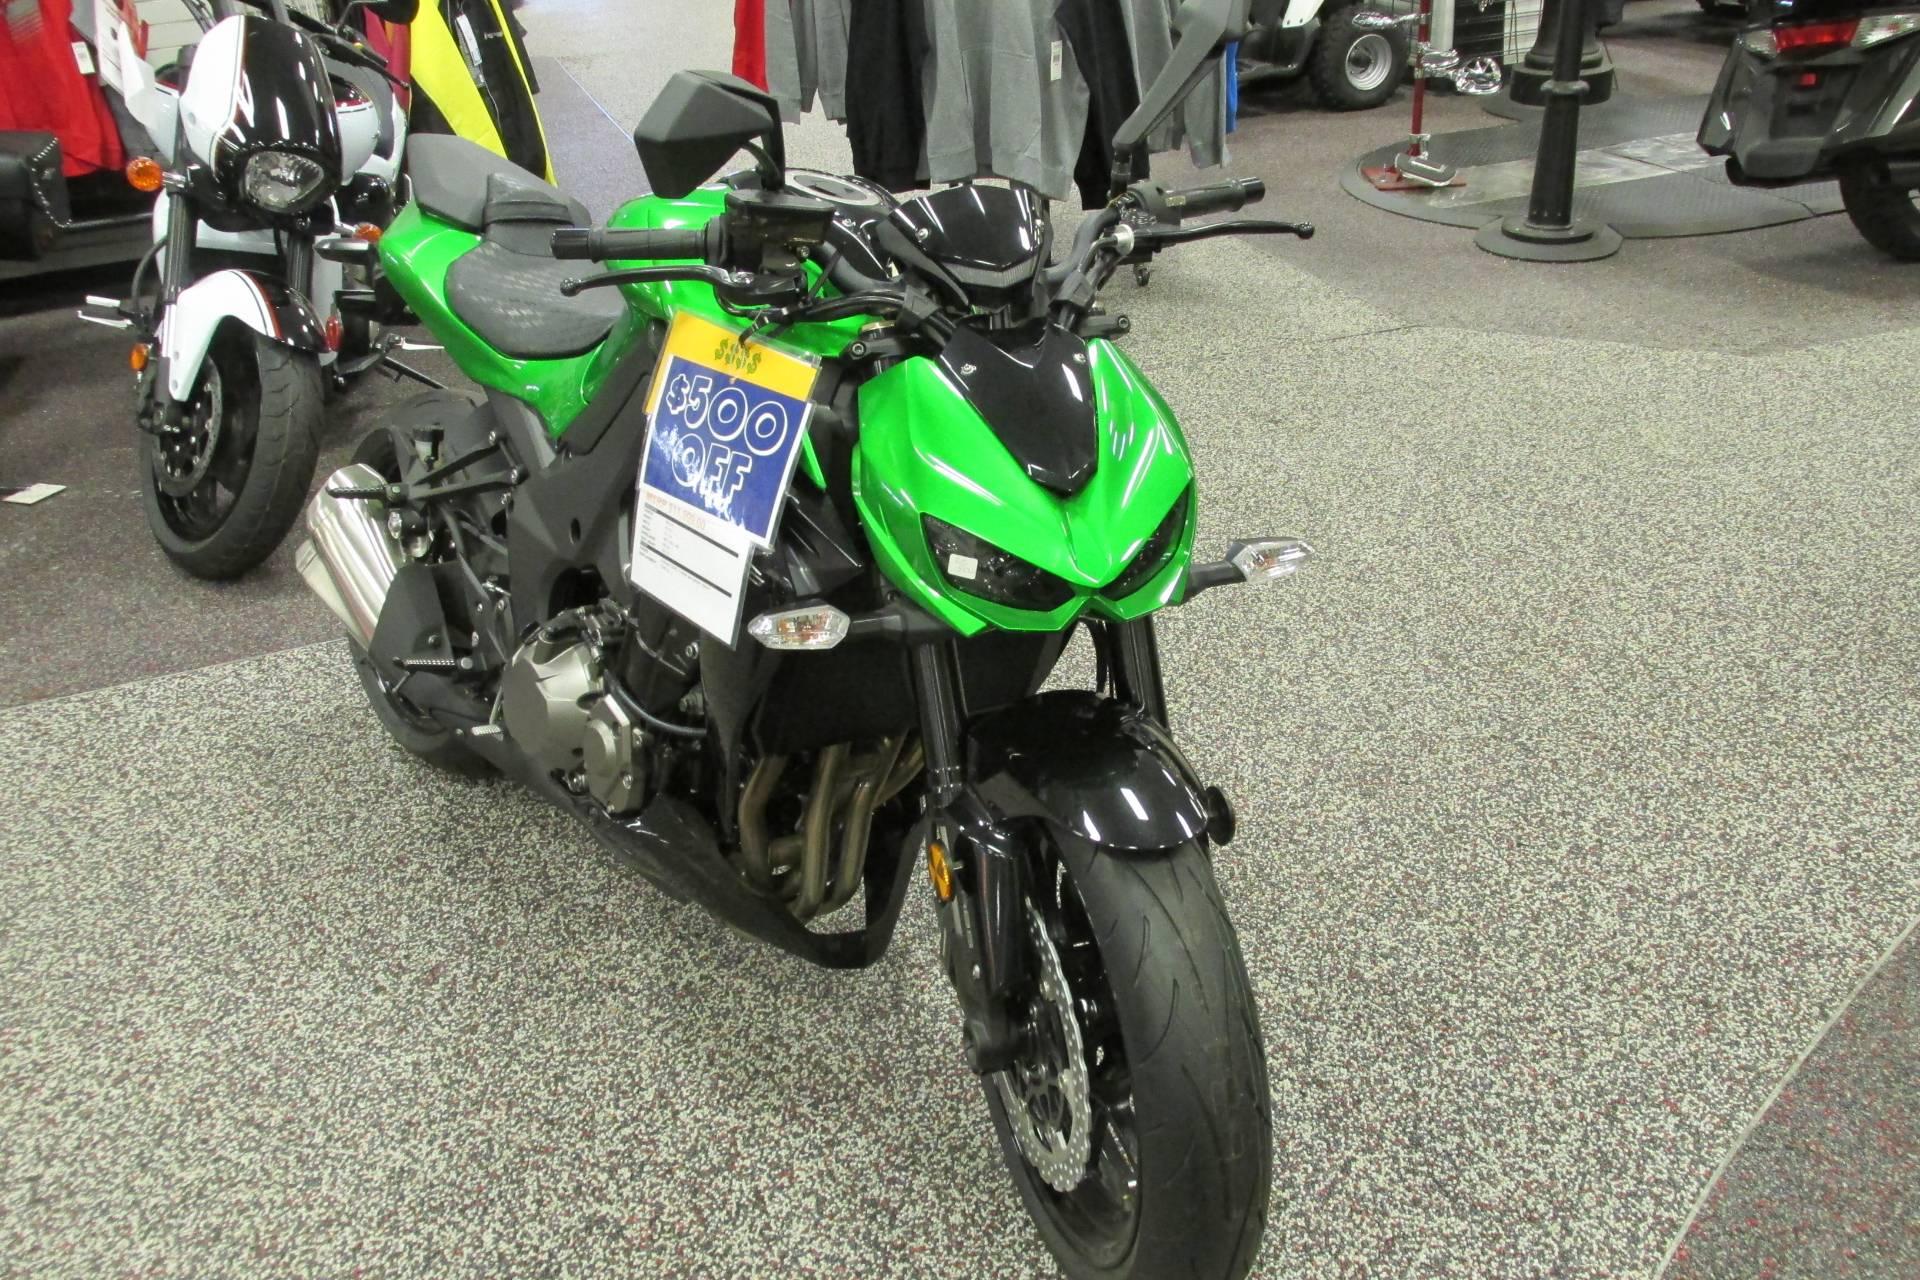 2015 Kawasaki Z1000 ABS in Springfield, Ohio